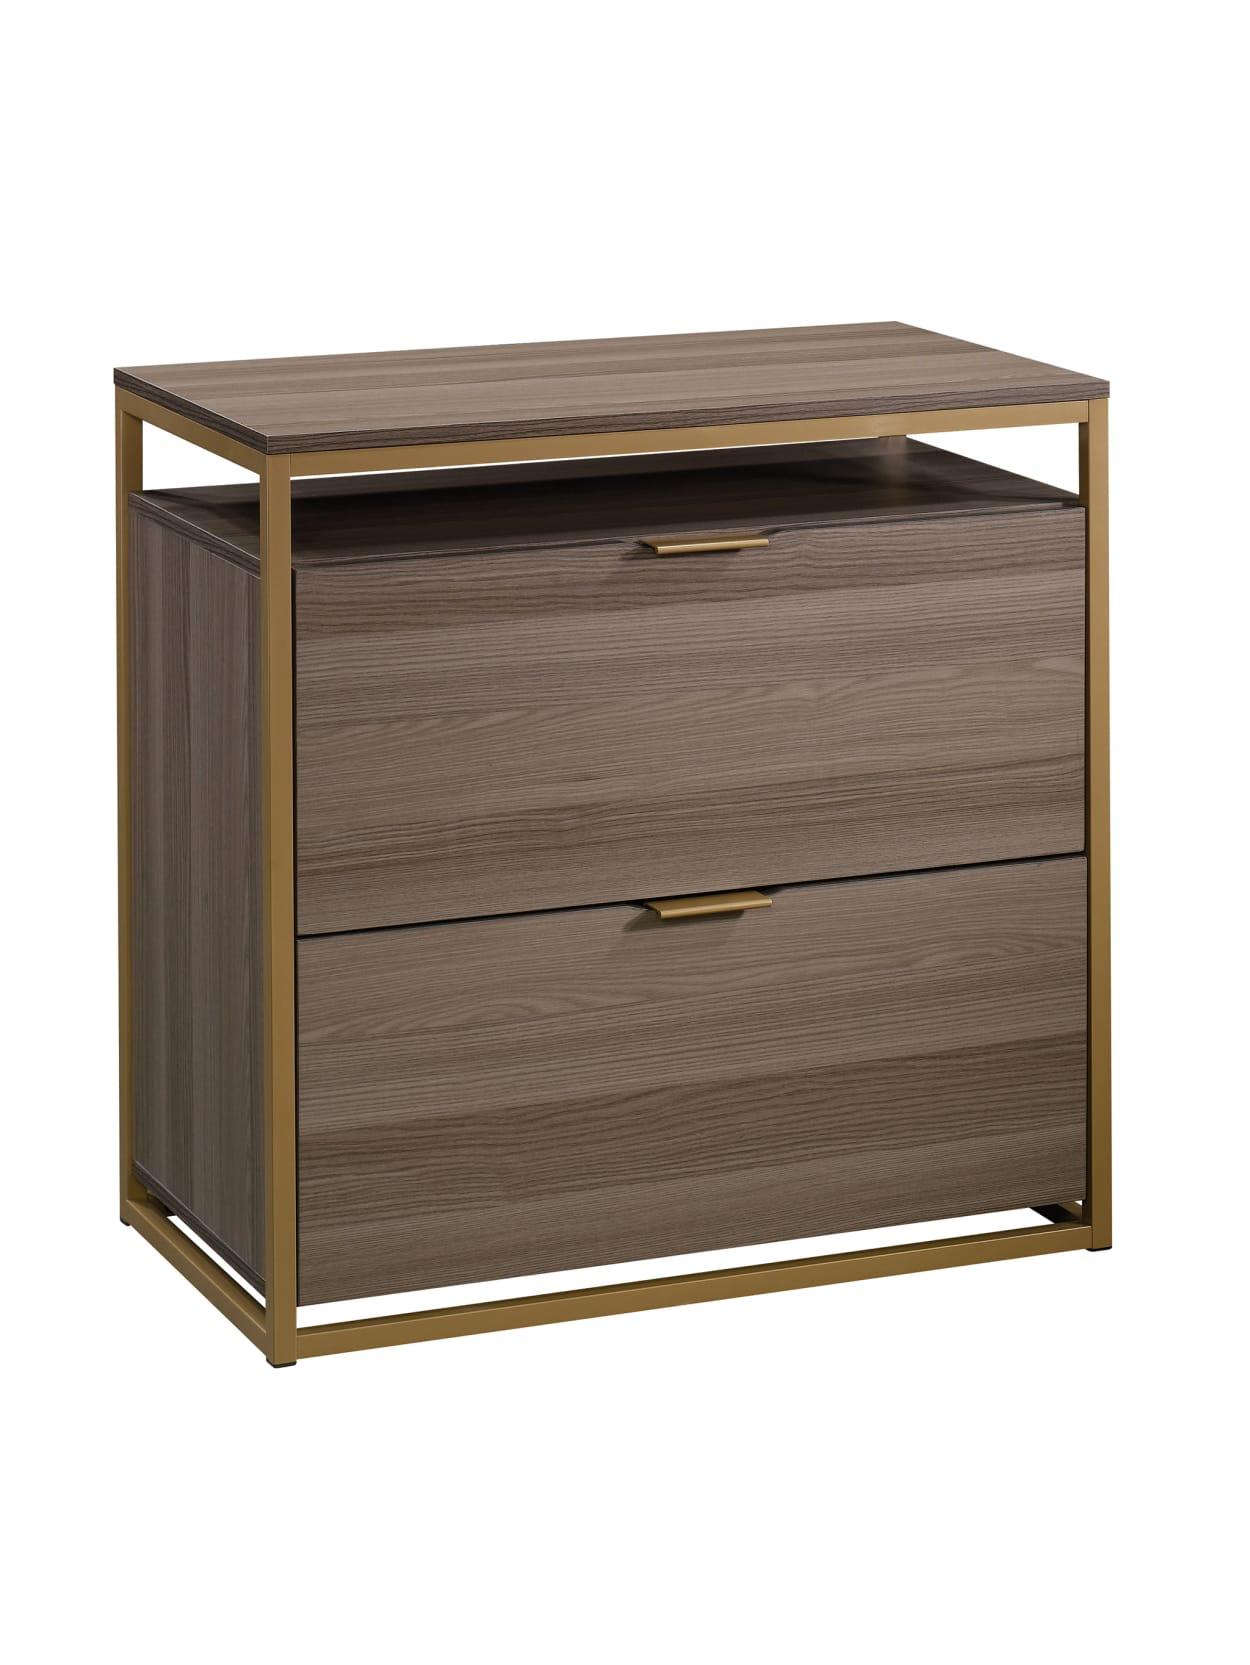 Sauder International Lux 34 34 W Lateral 34 Drawer File Cabinet